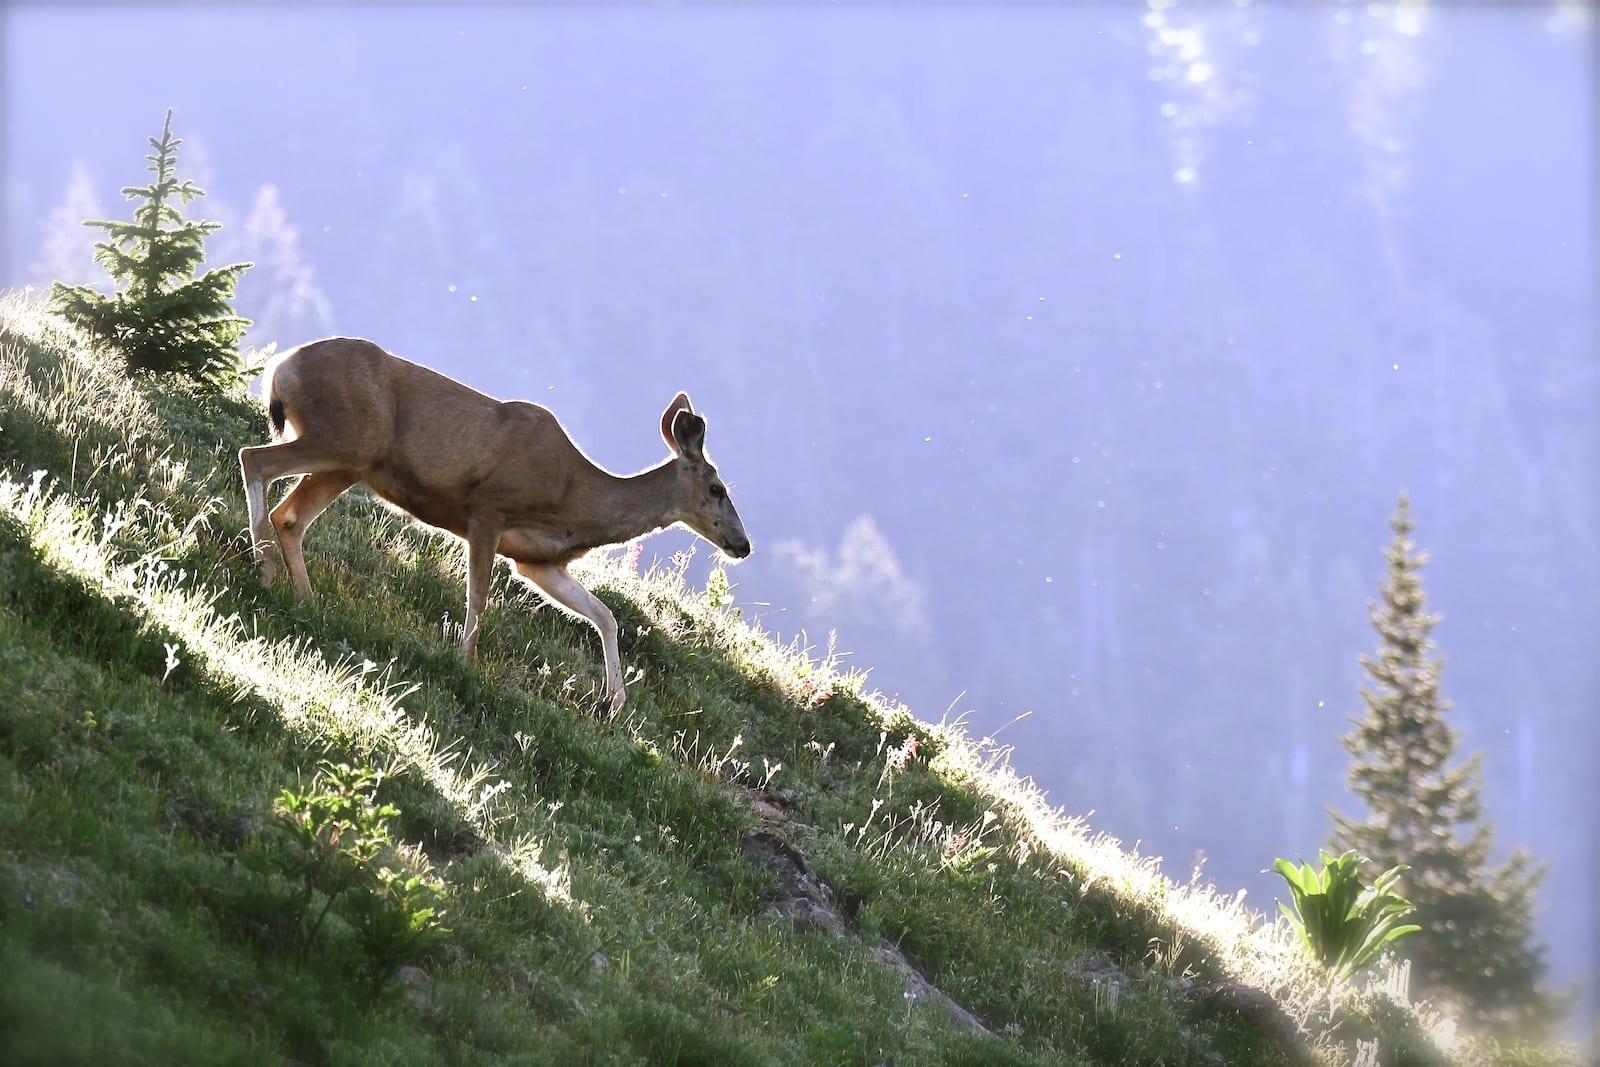 Washington Gulch Trail Deer Crested Butte CO